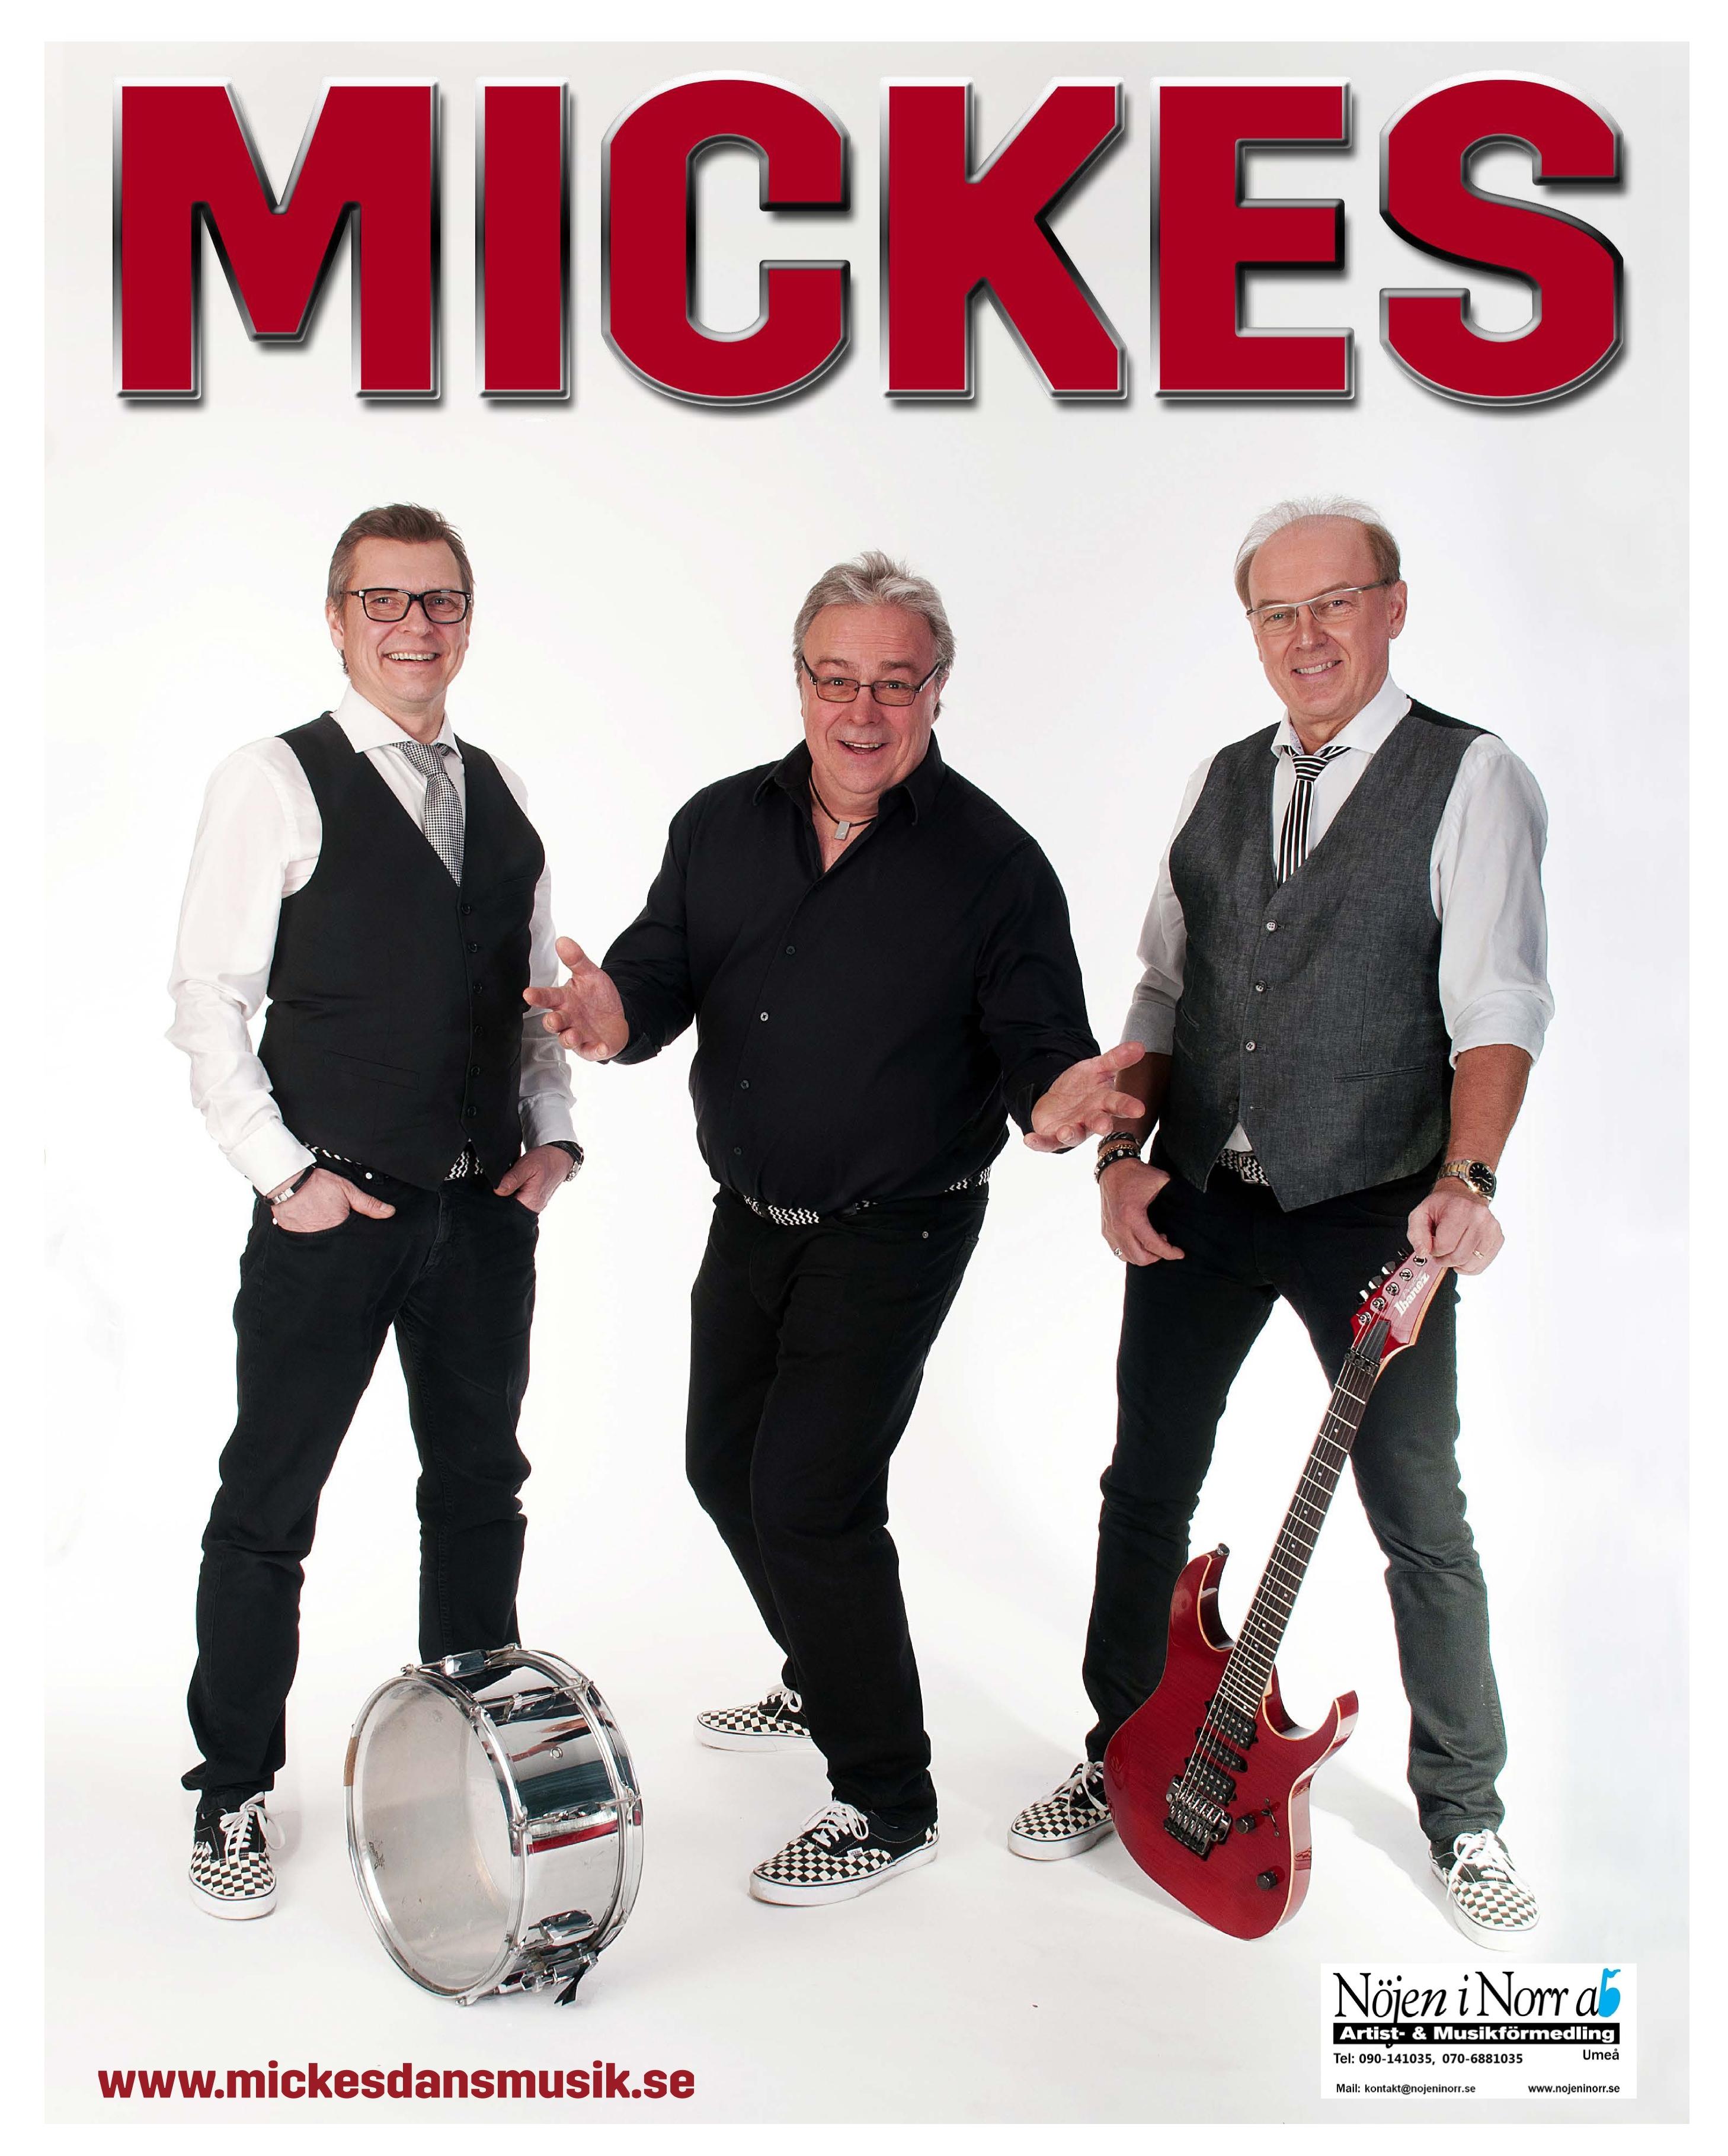 Mickes